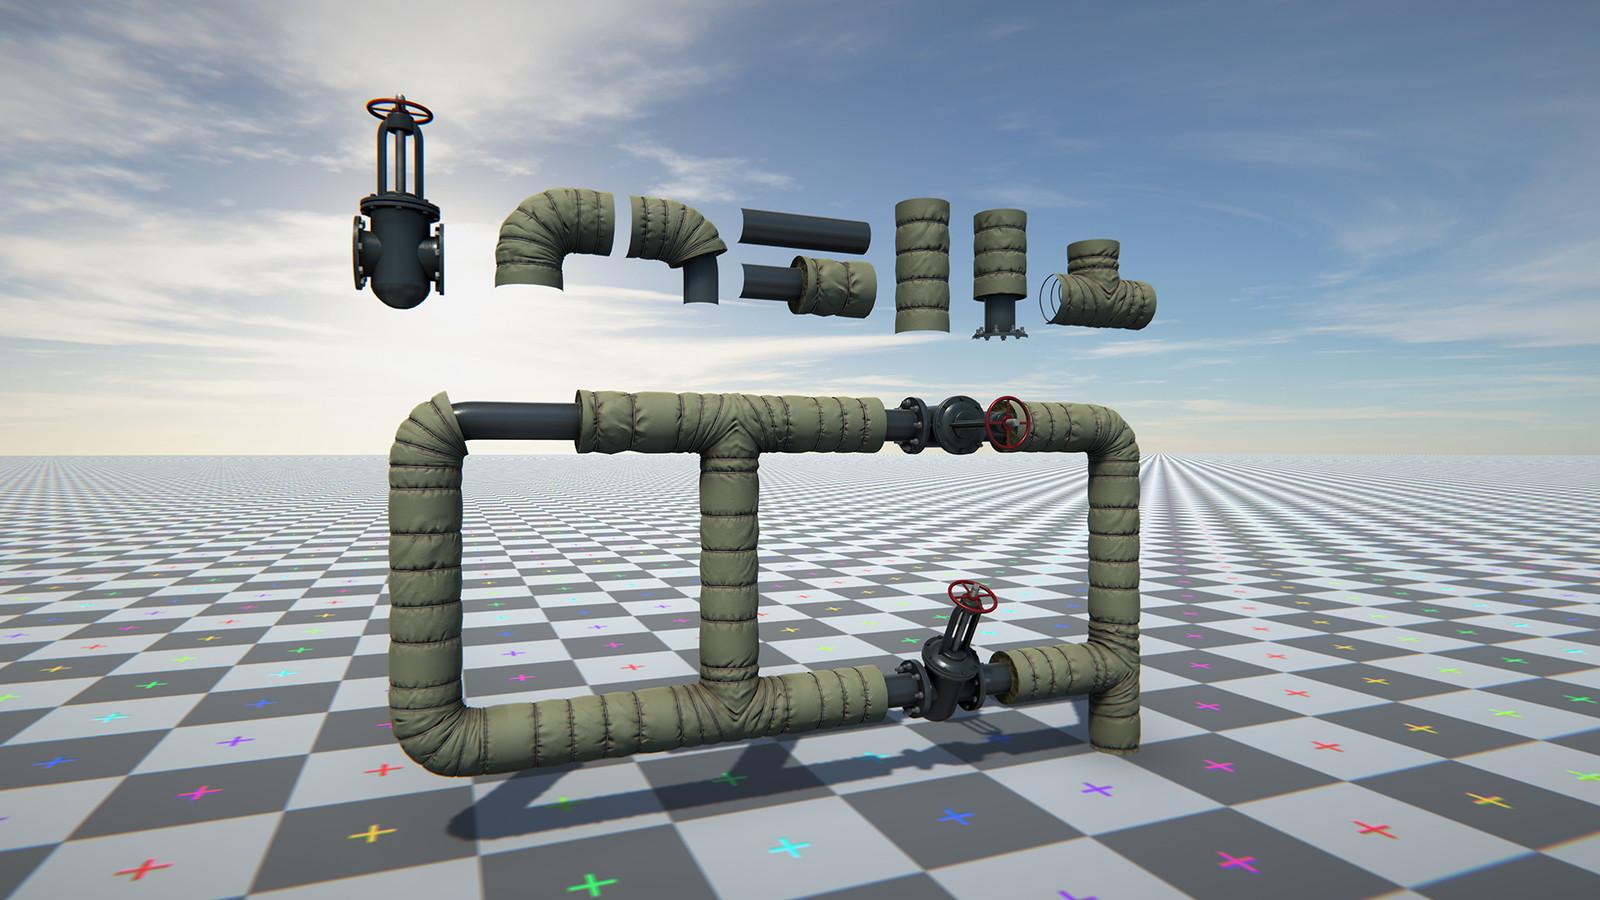 Modular pipes set